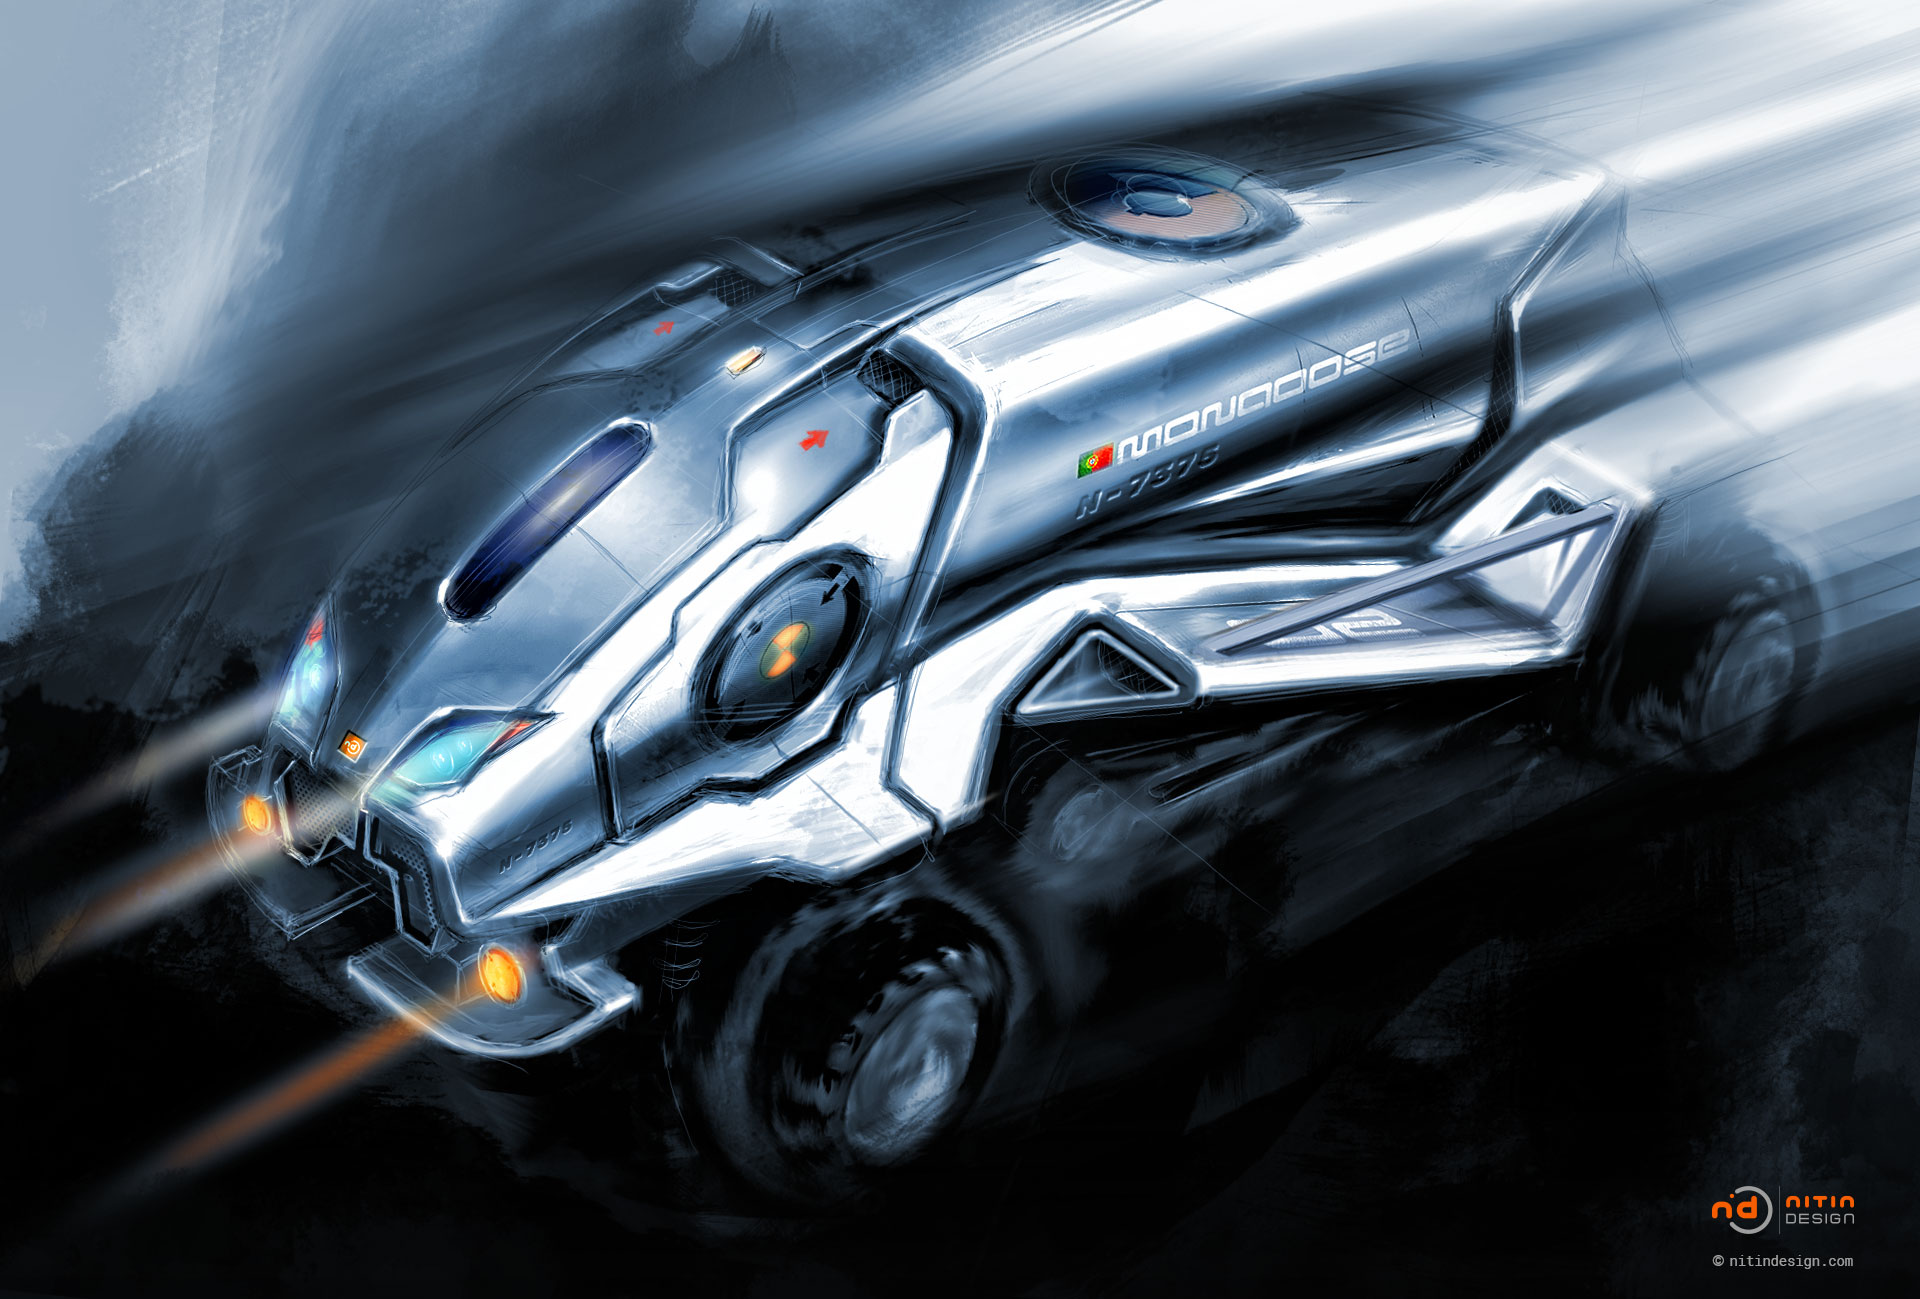 Mongoose-Vehicle-Nitin-Design-Nitin-Khosa